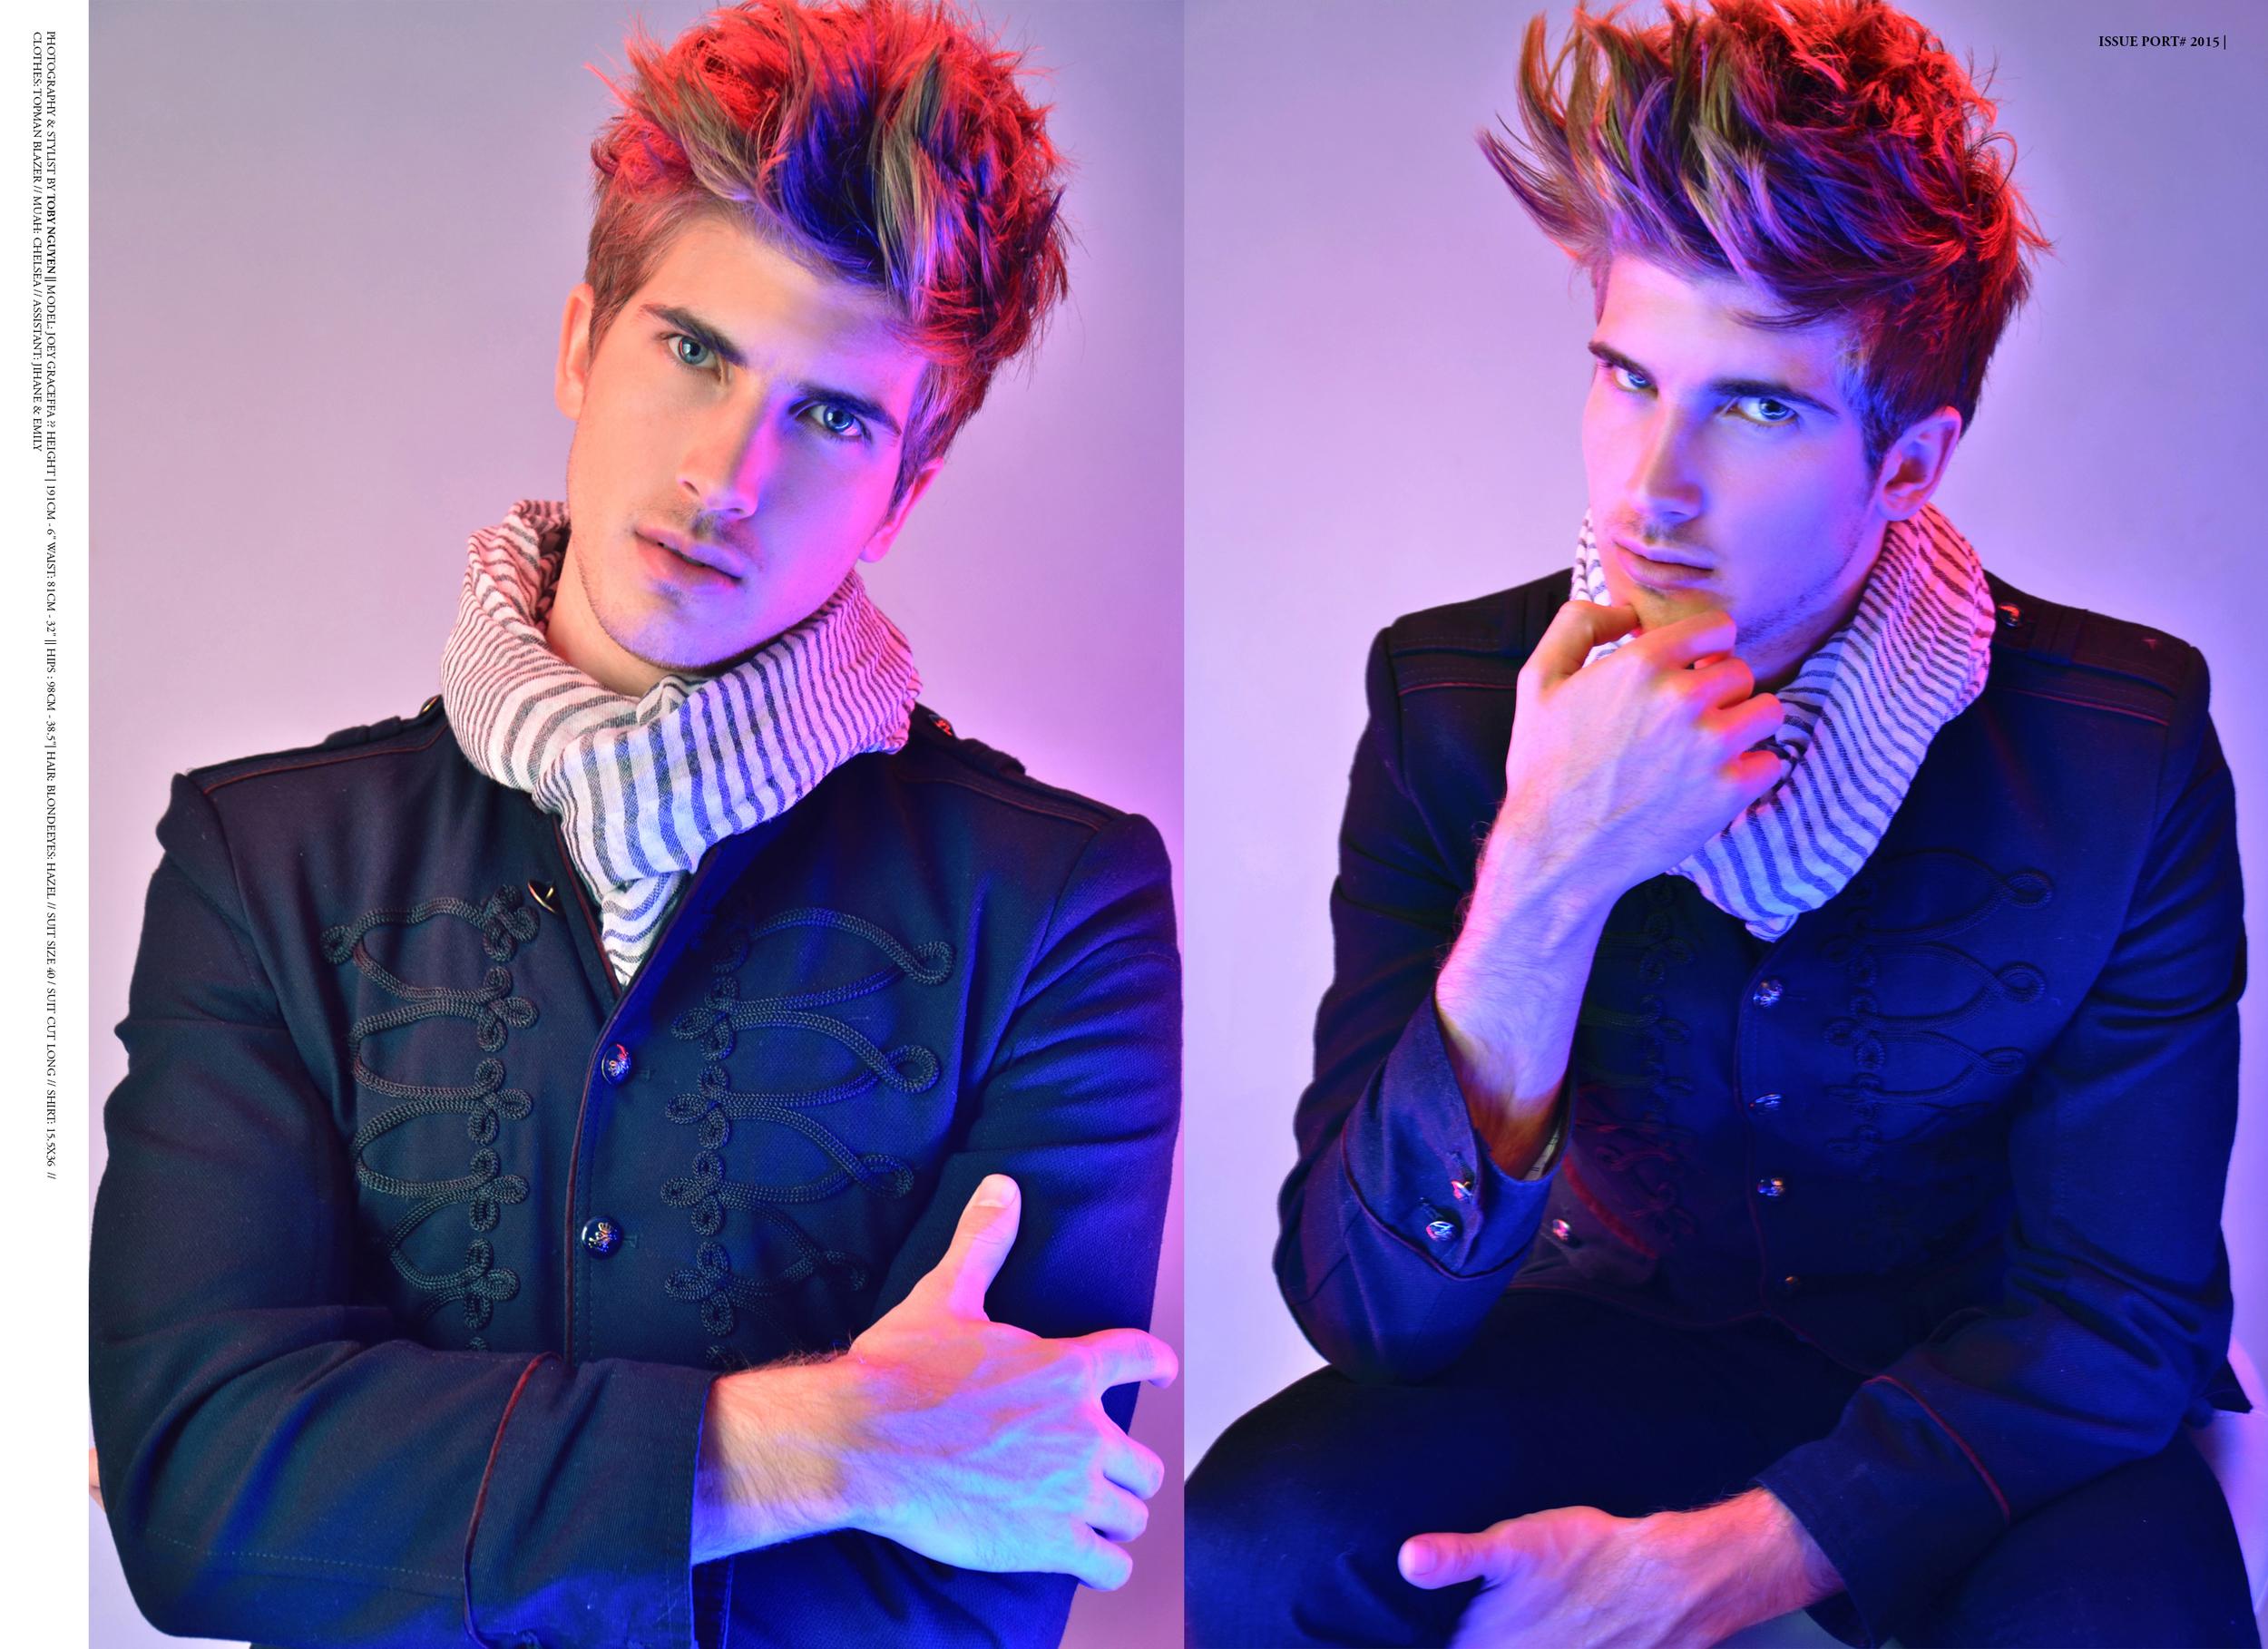 Joey Graceffa - Youtuber